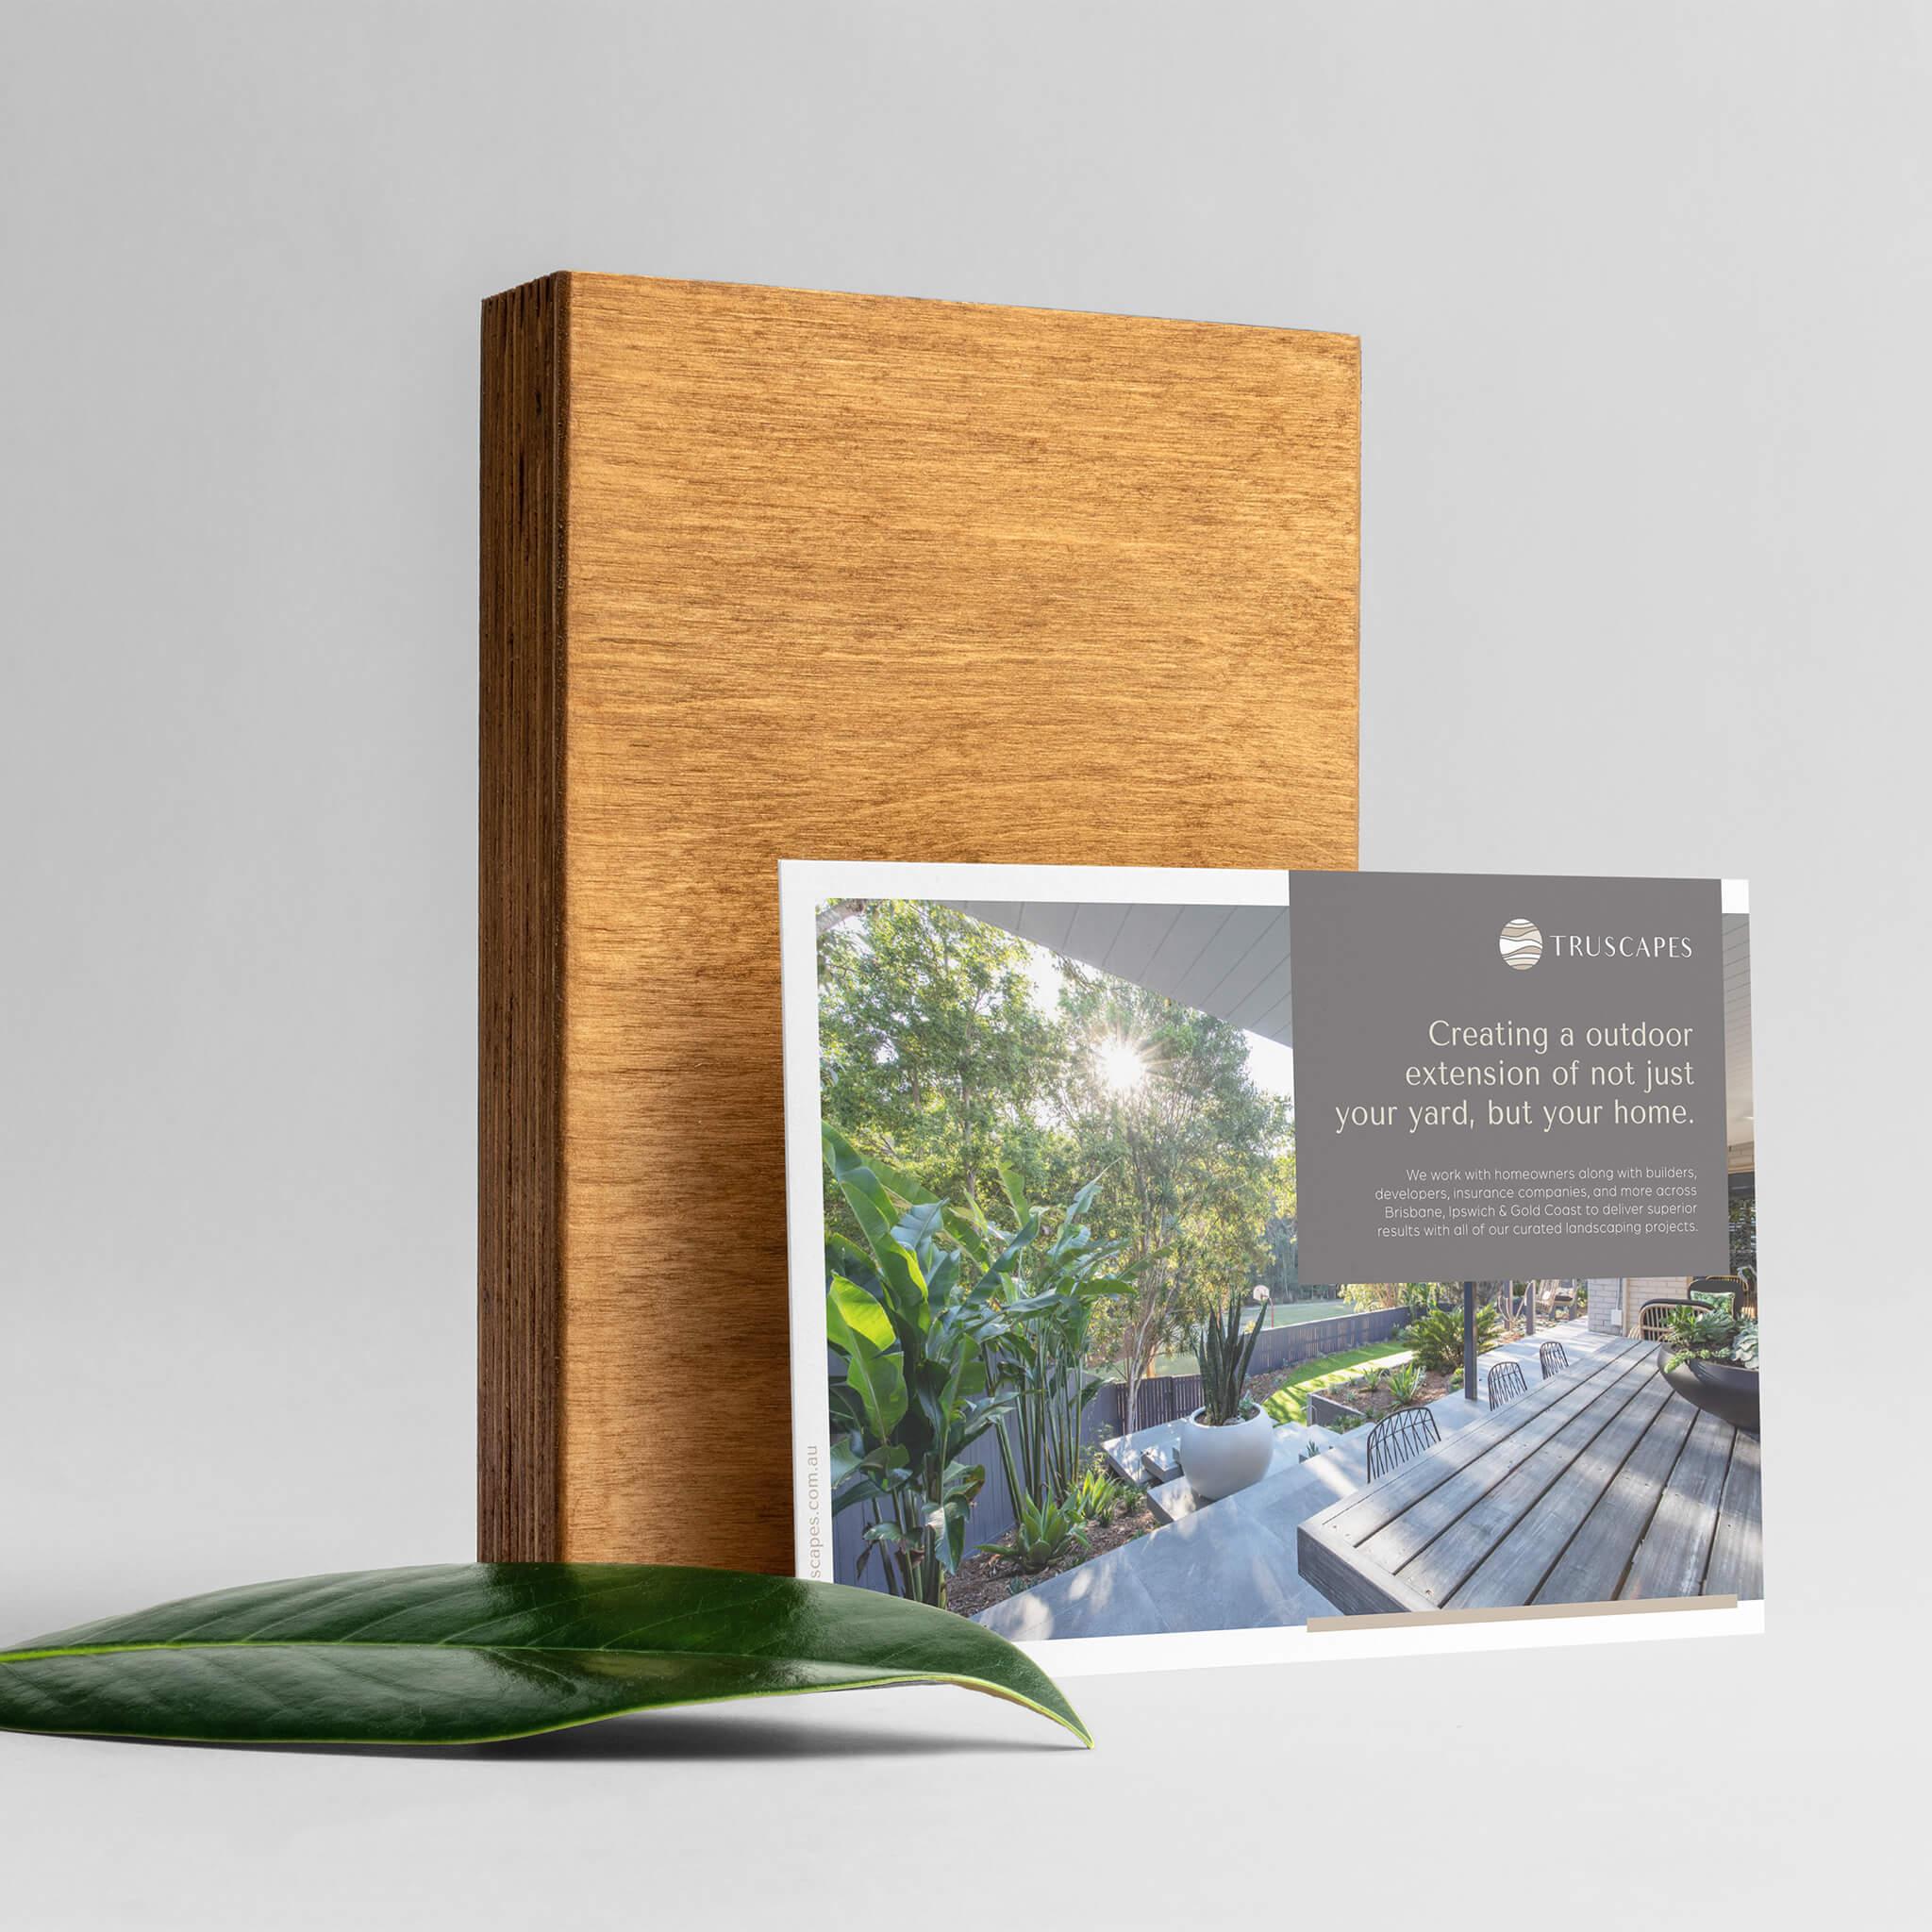 https://zanandcocreative.com.au/wp-content/uploads/2021/04/Truscapes-Flyer-Design-Branding-Design.jpg